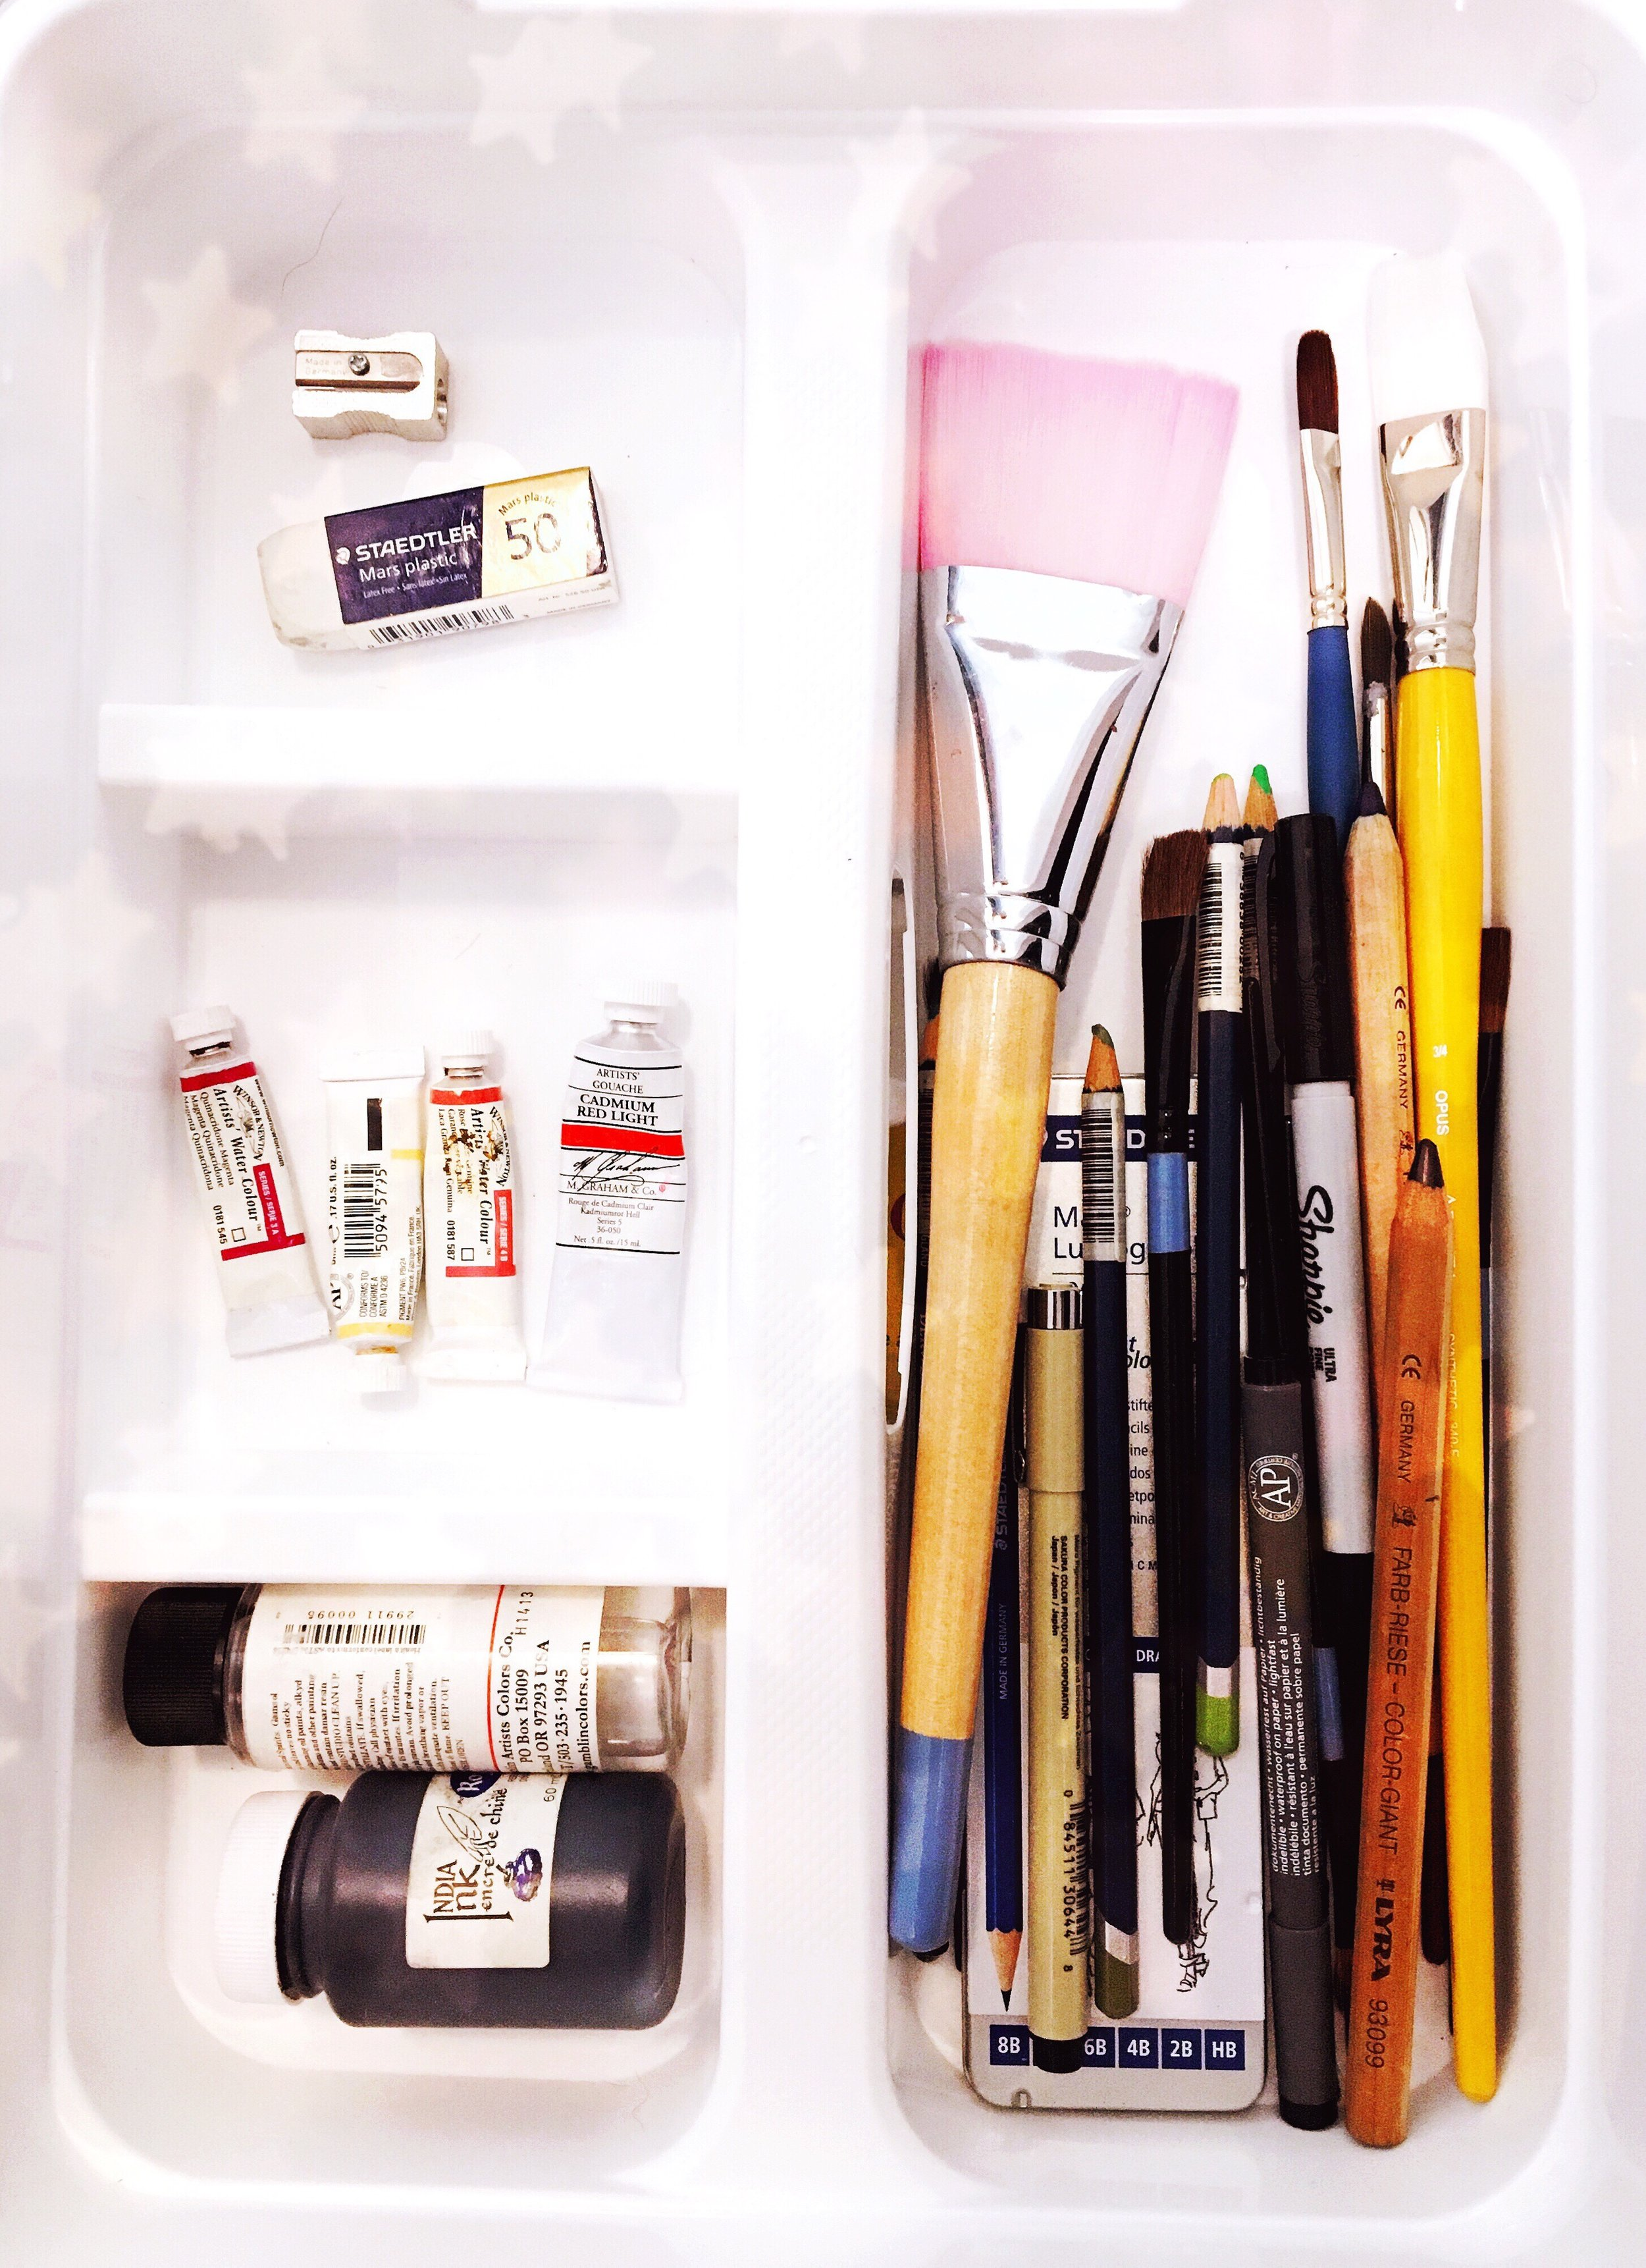 THE FUNKY FRESH / ART SUPPLIES ORGANIZATION